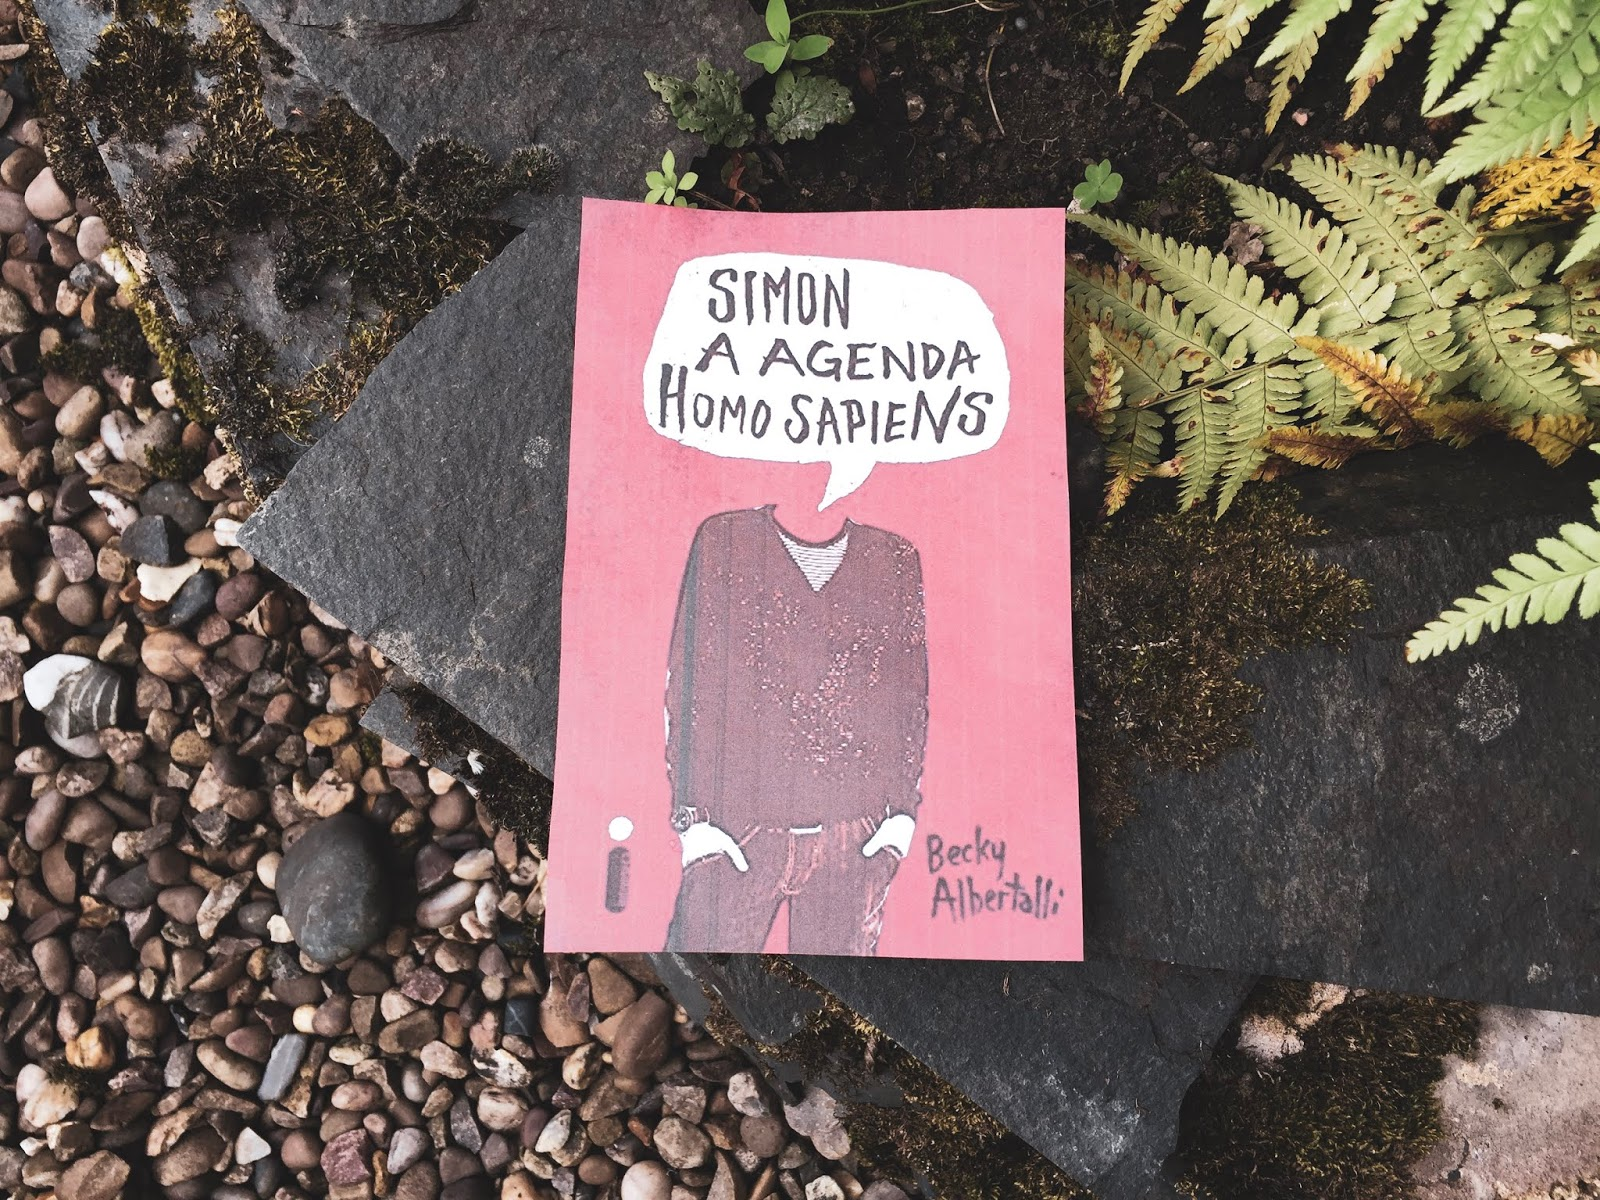 simon vs the home sapien agenda, book, love simon, gay, lgbtq, lgbt, love story, romcom, bookish, book review